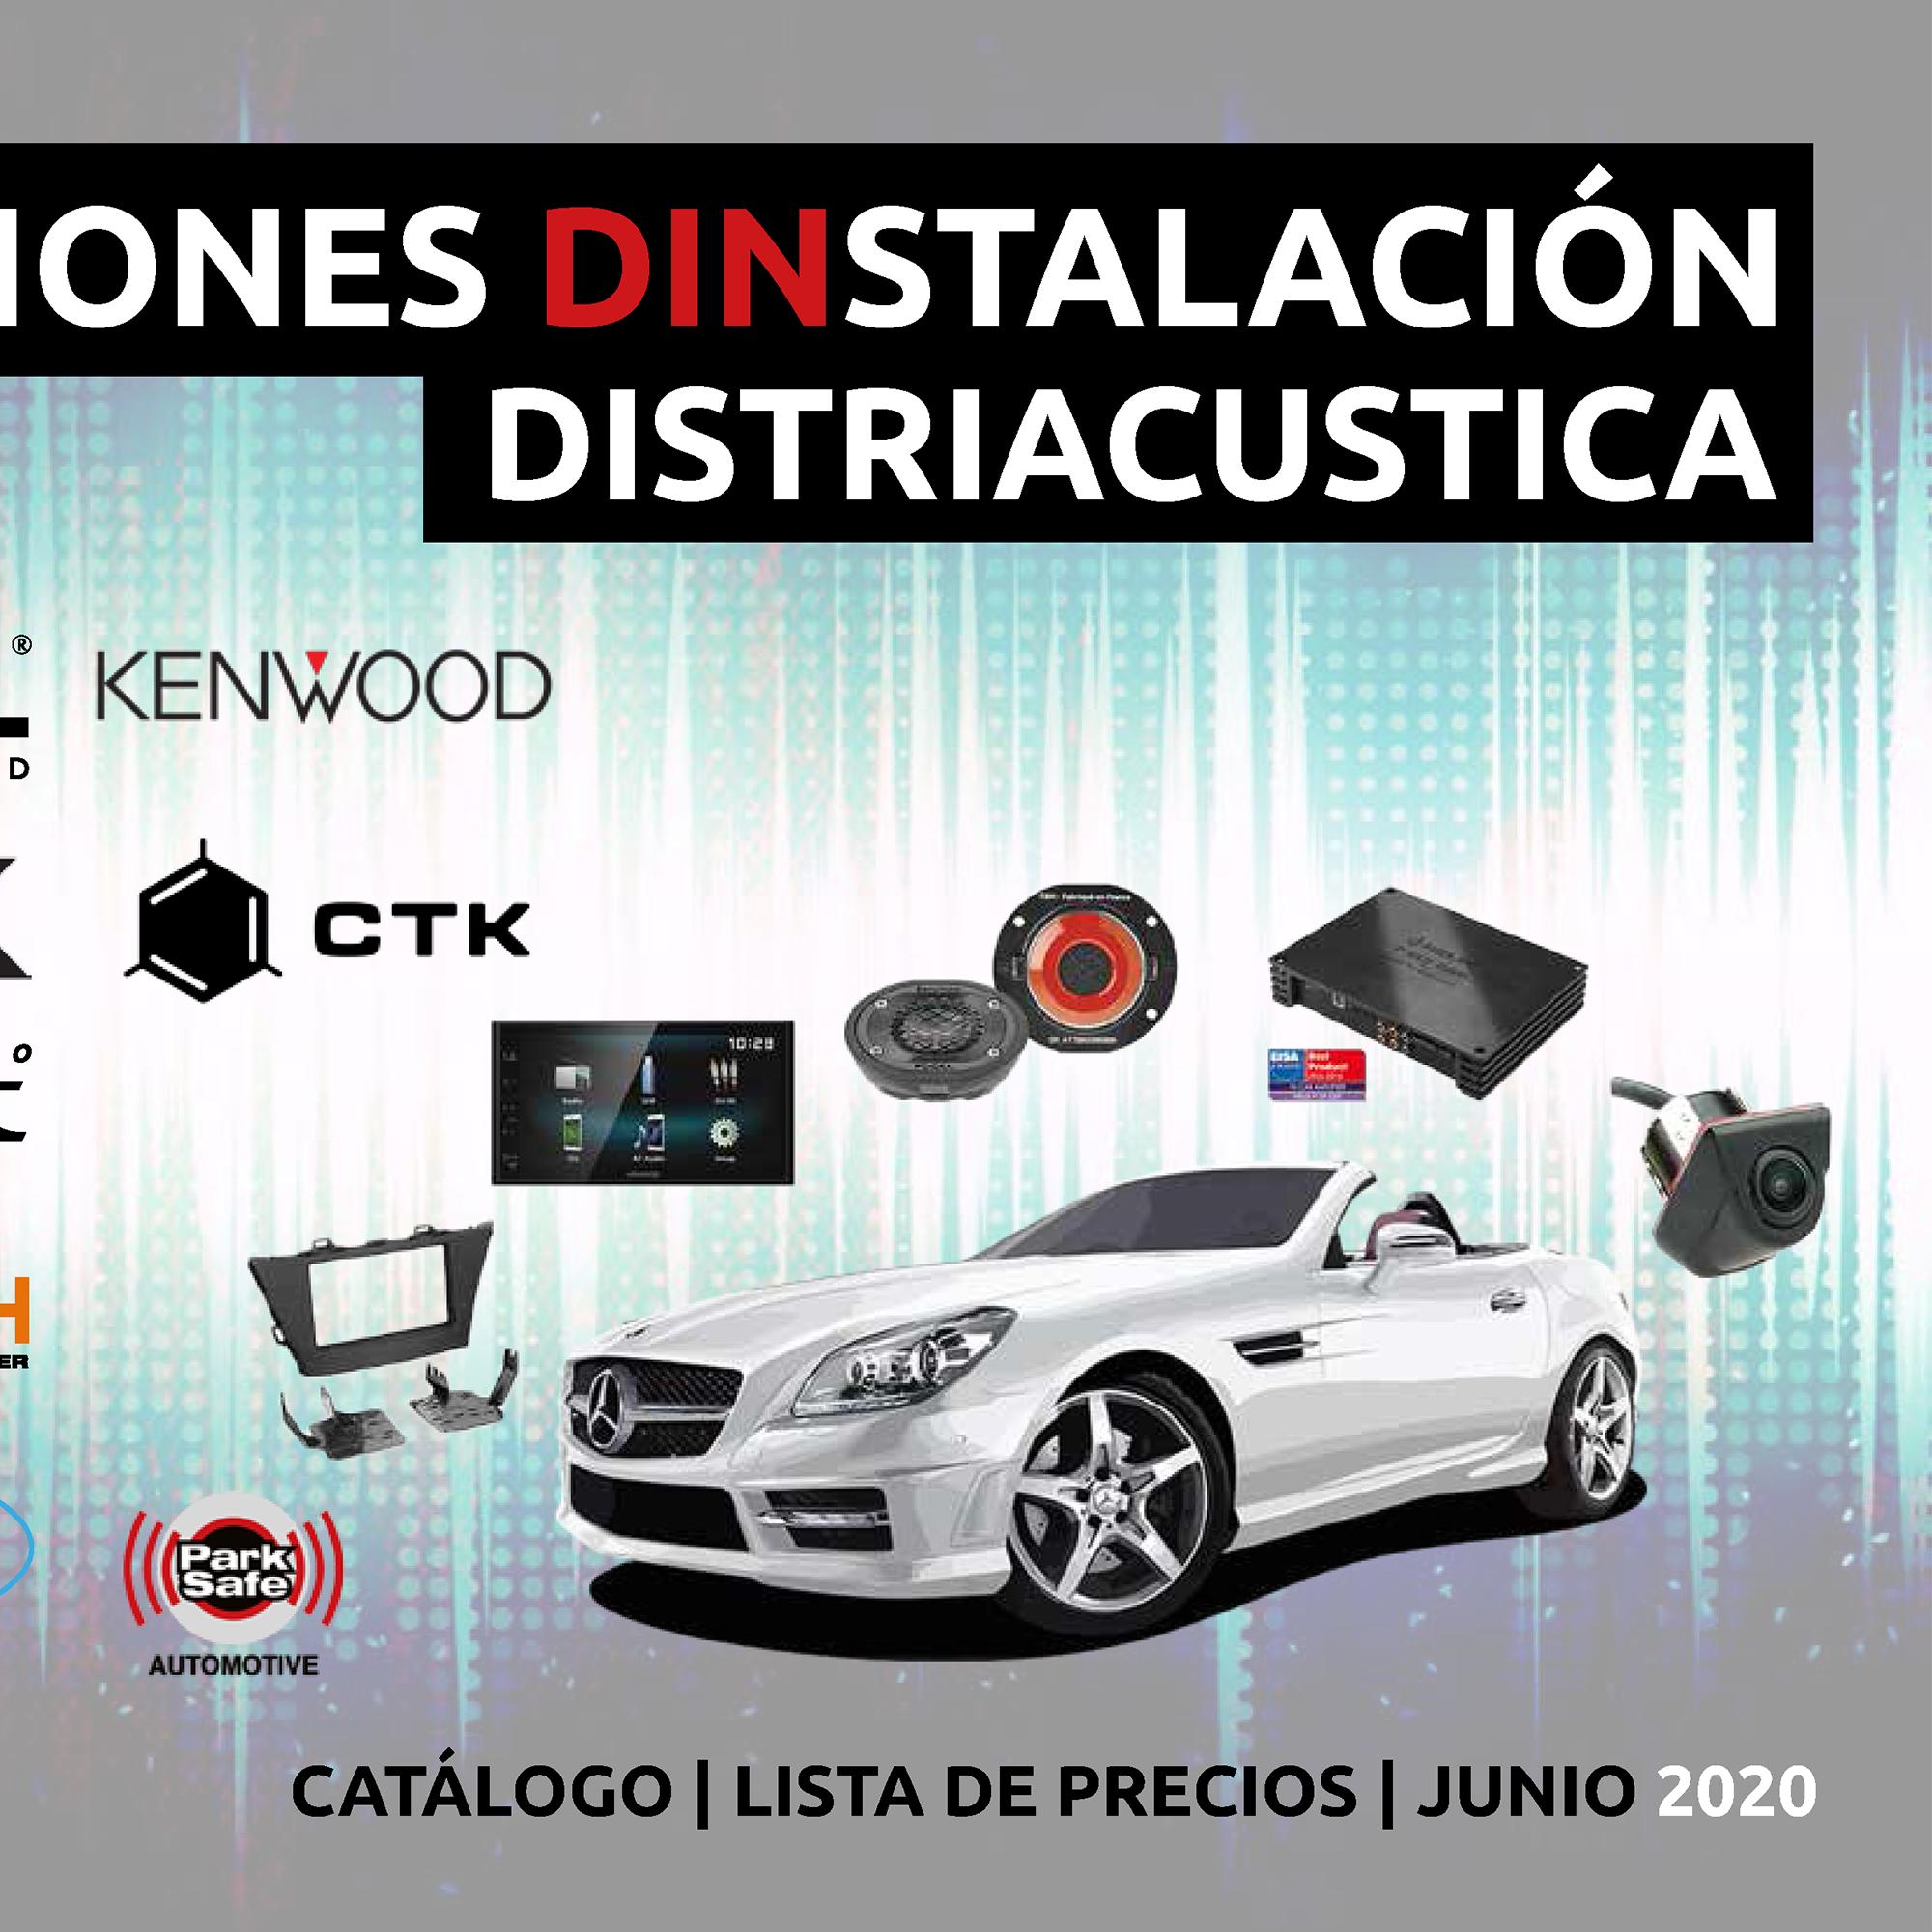 Catálogo Distriacustica junio 2020 España